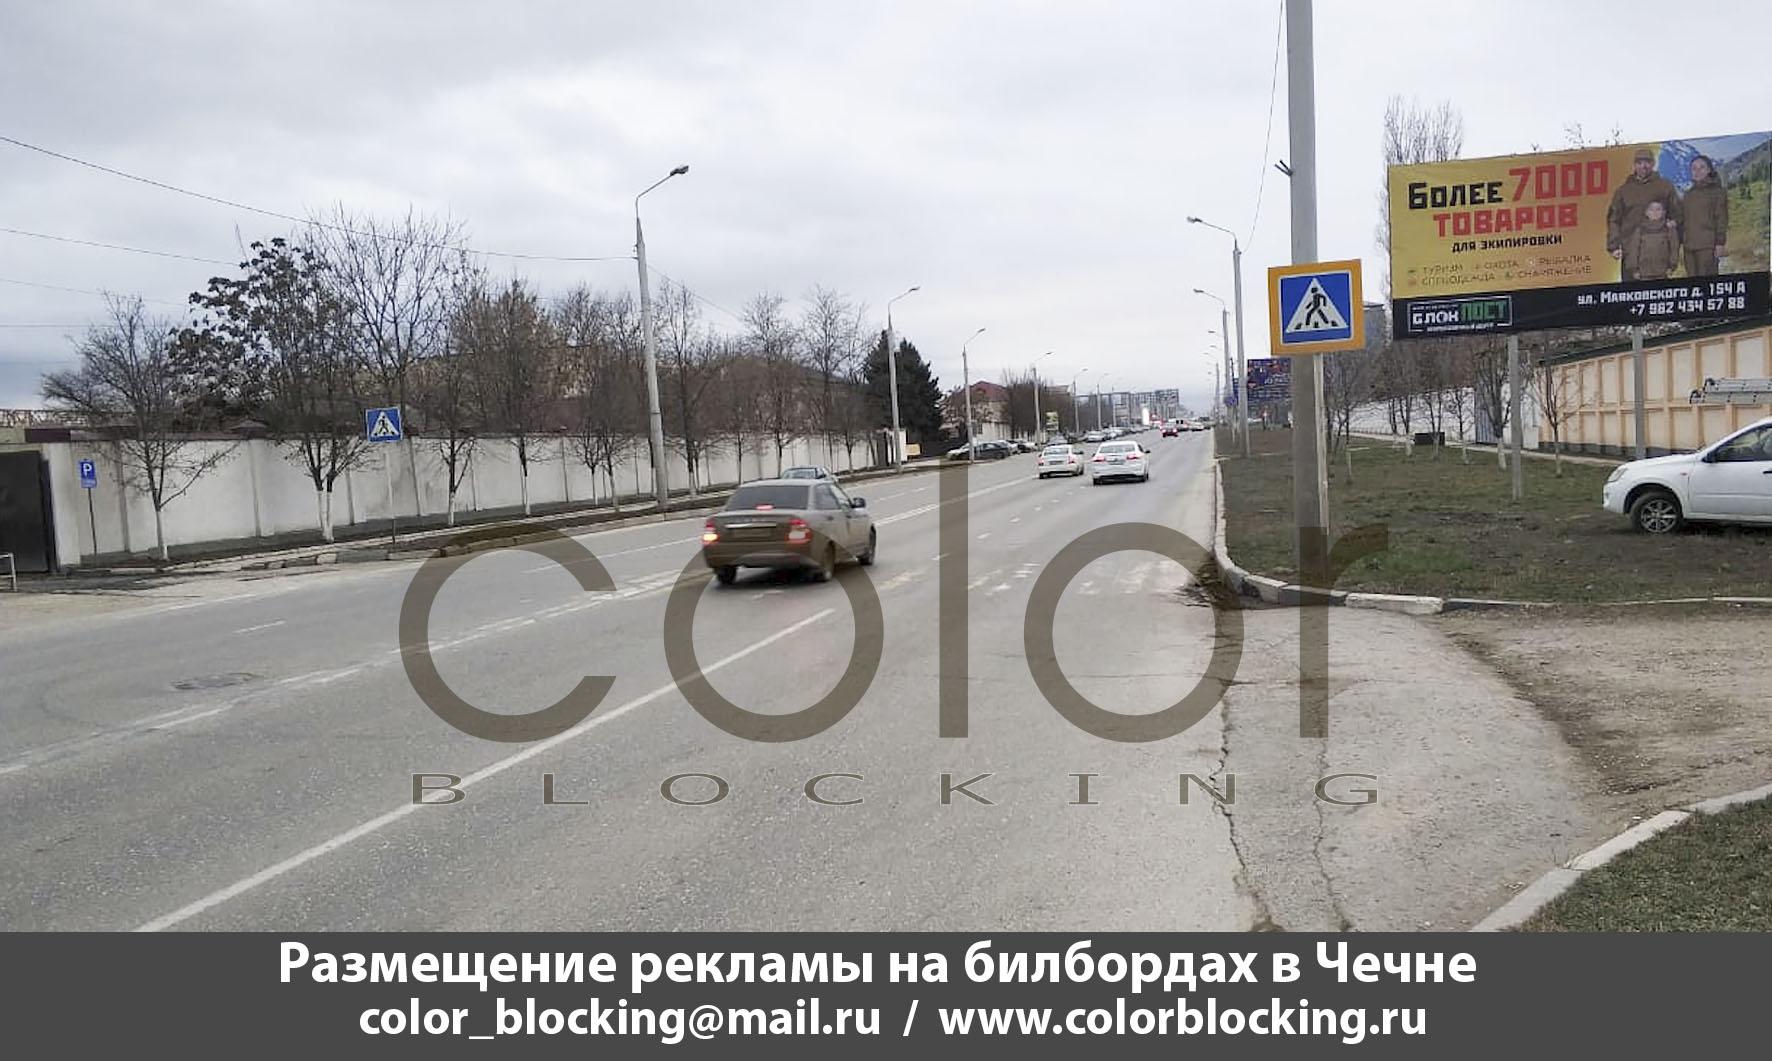 Реклама на билбордах в Грозном БлокПост 3х6